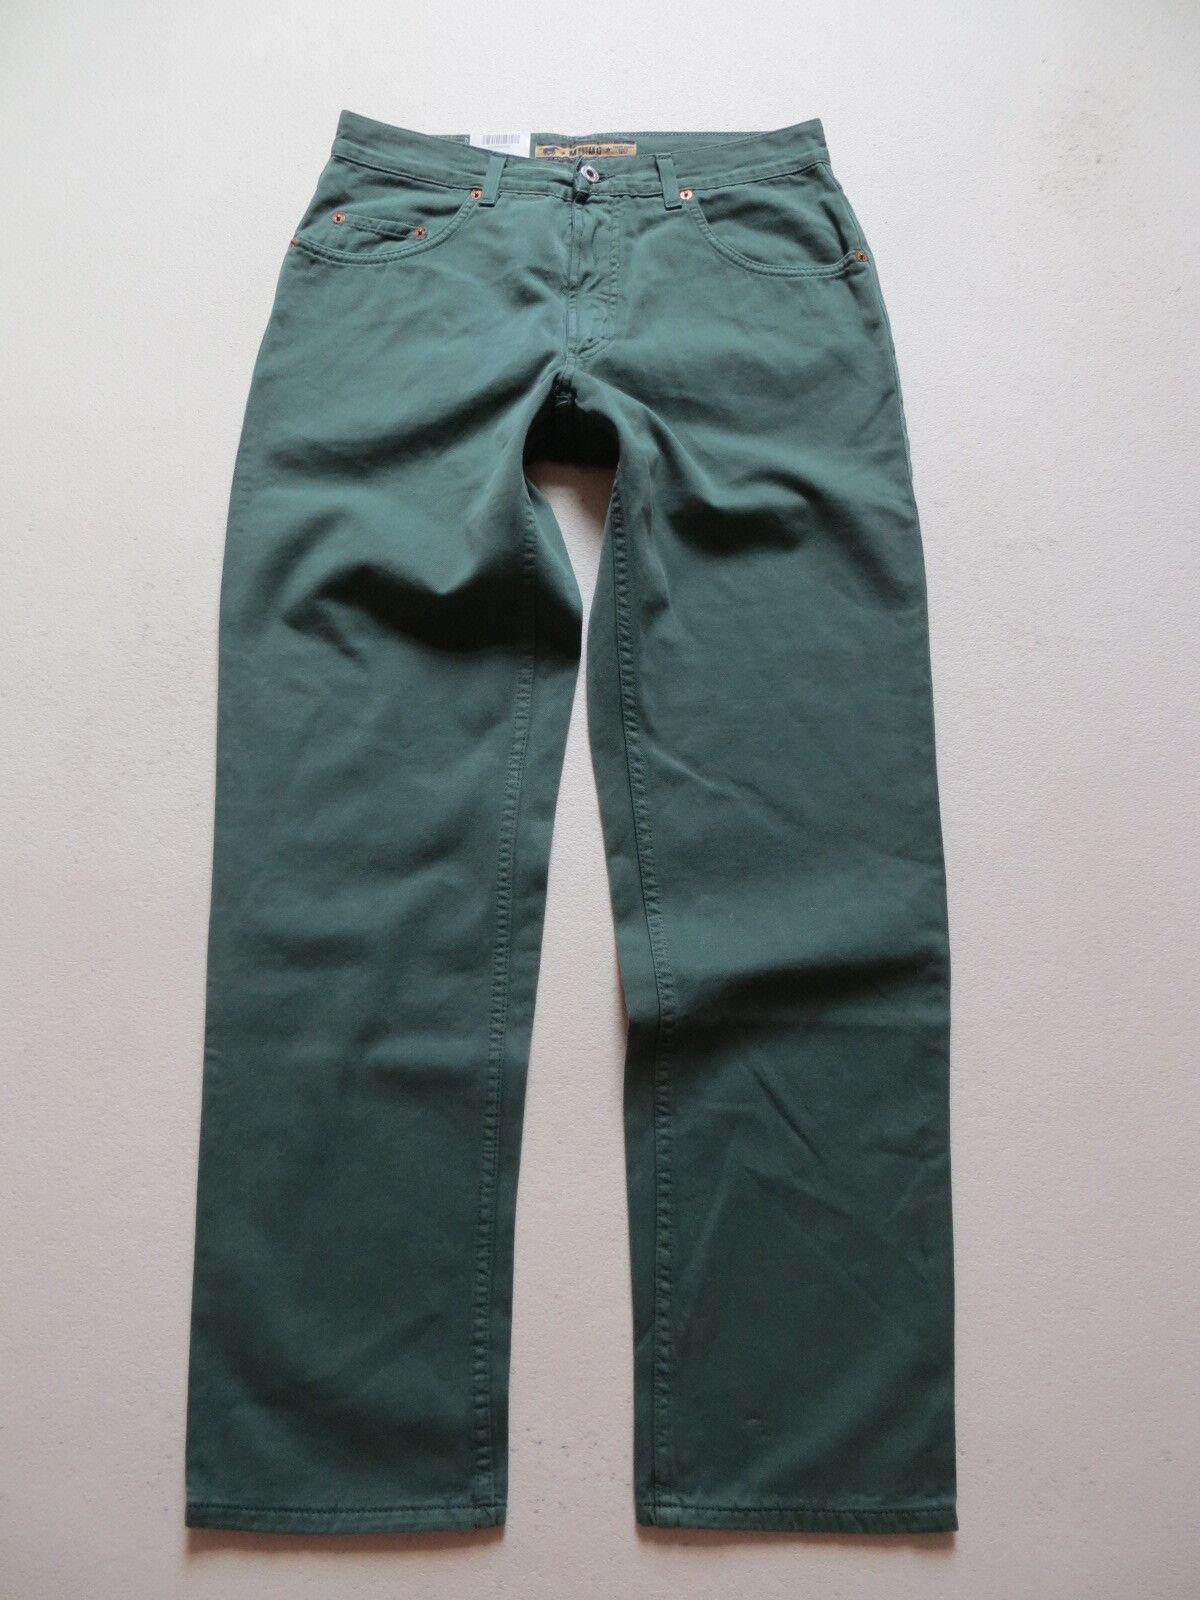 Mustang NEVADA Jeans Hose W 36  L 30 green NEU   green coloured Oldschool Denim